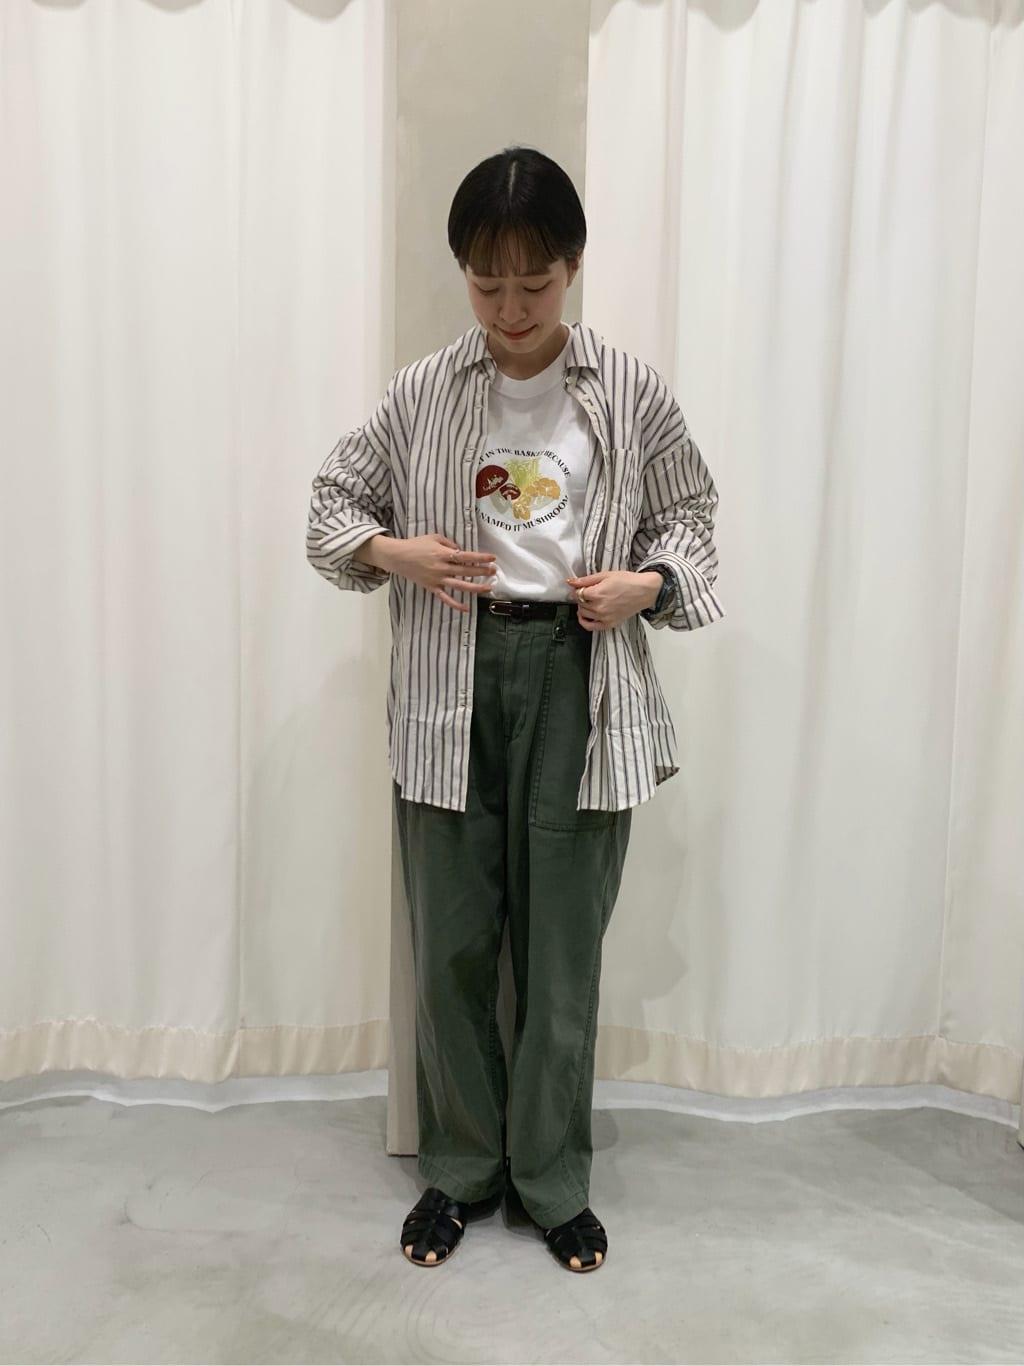 - CHILD WOMAN CHILD WOMAN , PAR ICI ルミネ横浜 身長:158cm 2021.08.12